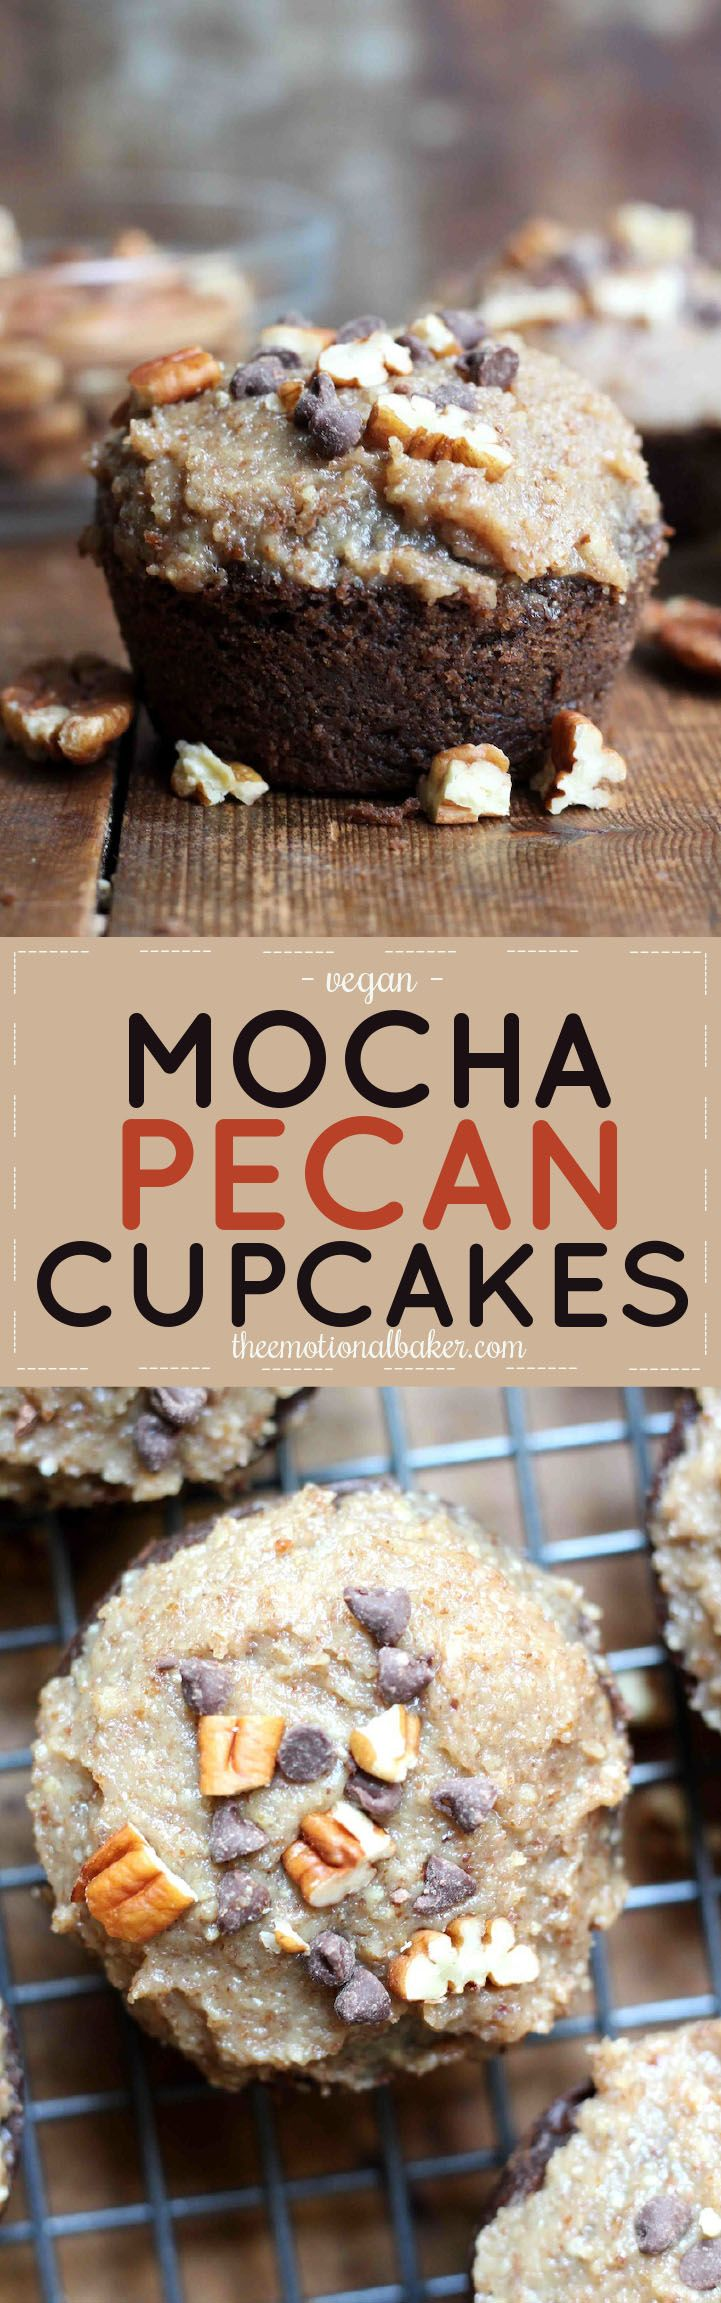 Mocha Pecan Cupcakes Recipe Coffee Recipes Dessert Recipes Coconut Oil Coffee Recipe